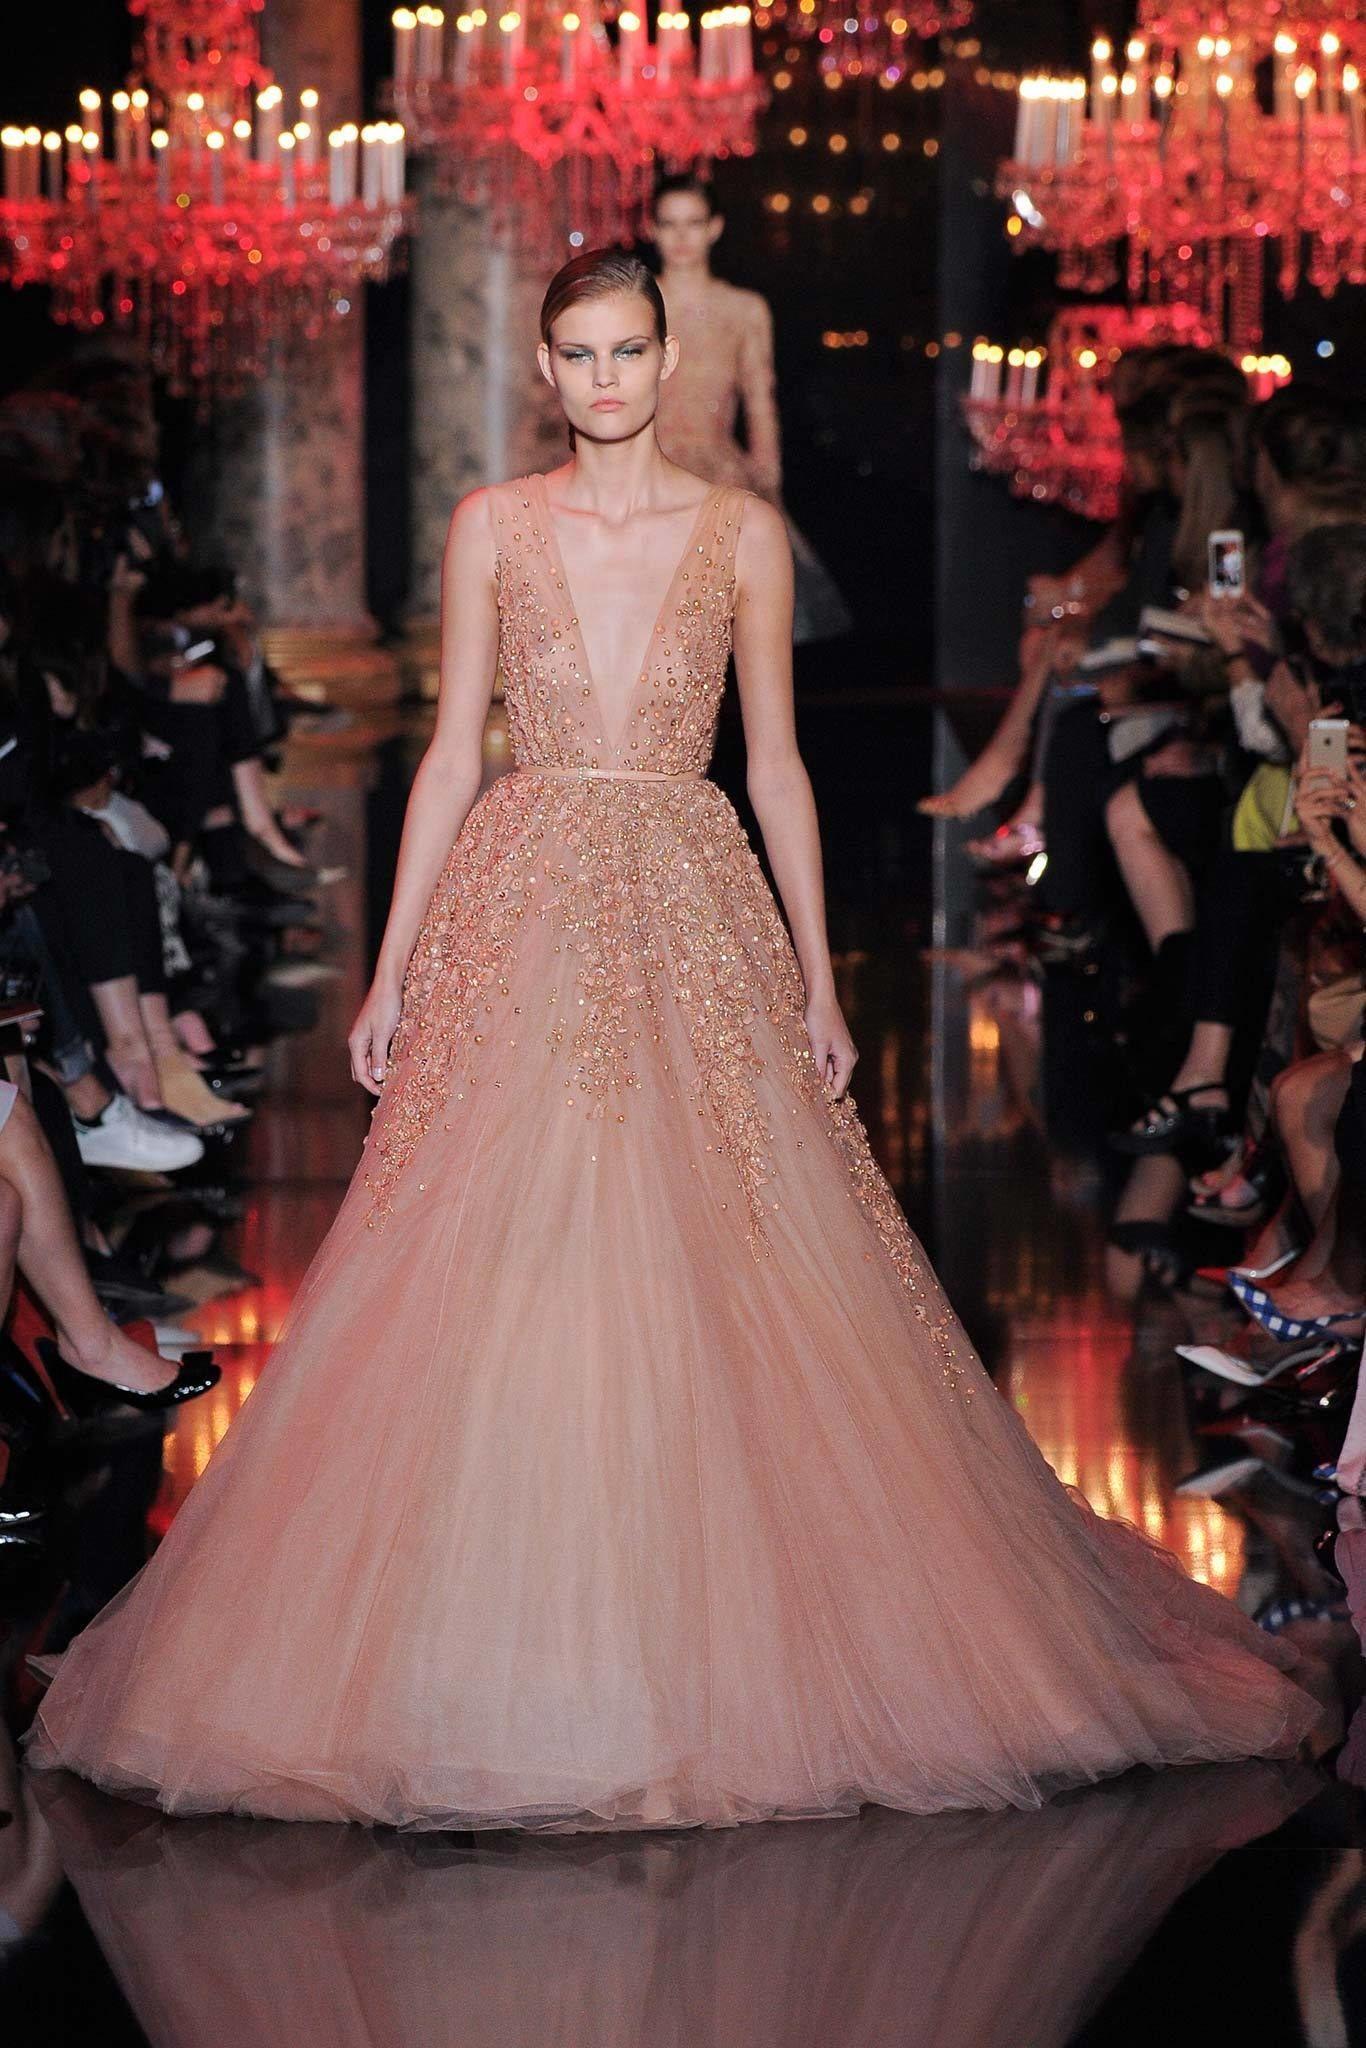 Elie Saab Fall 2014 Couture Fashion Show | Alta costura, Costura y ...